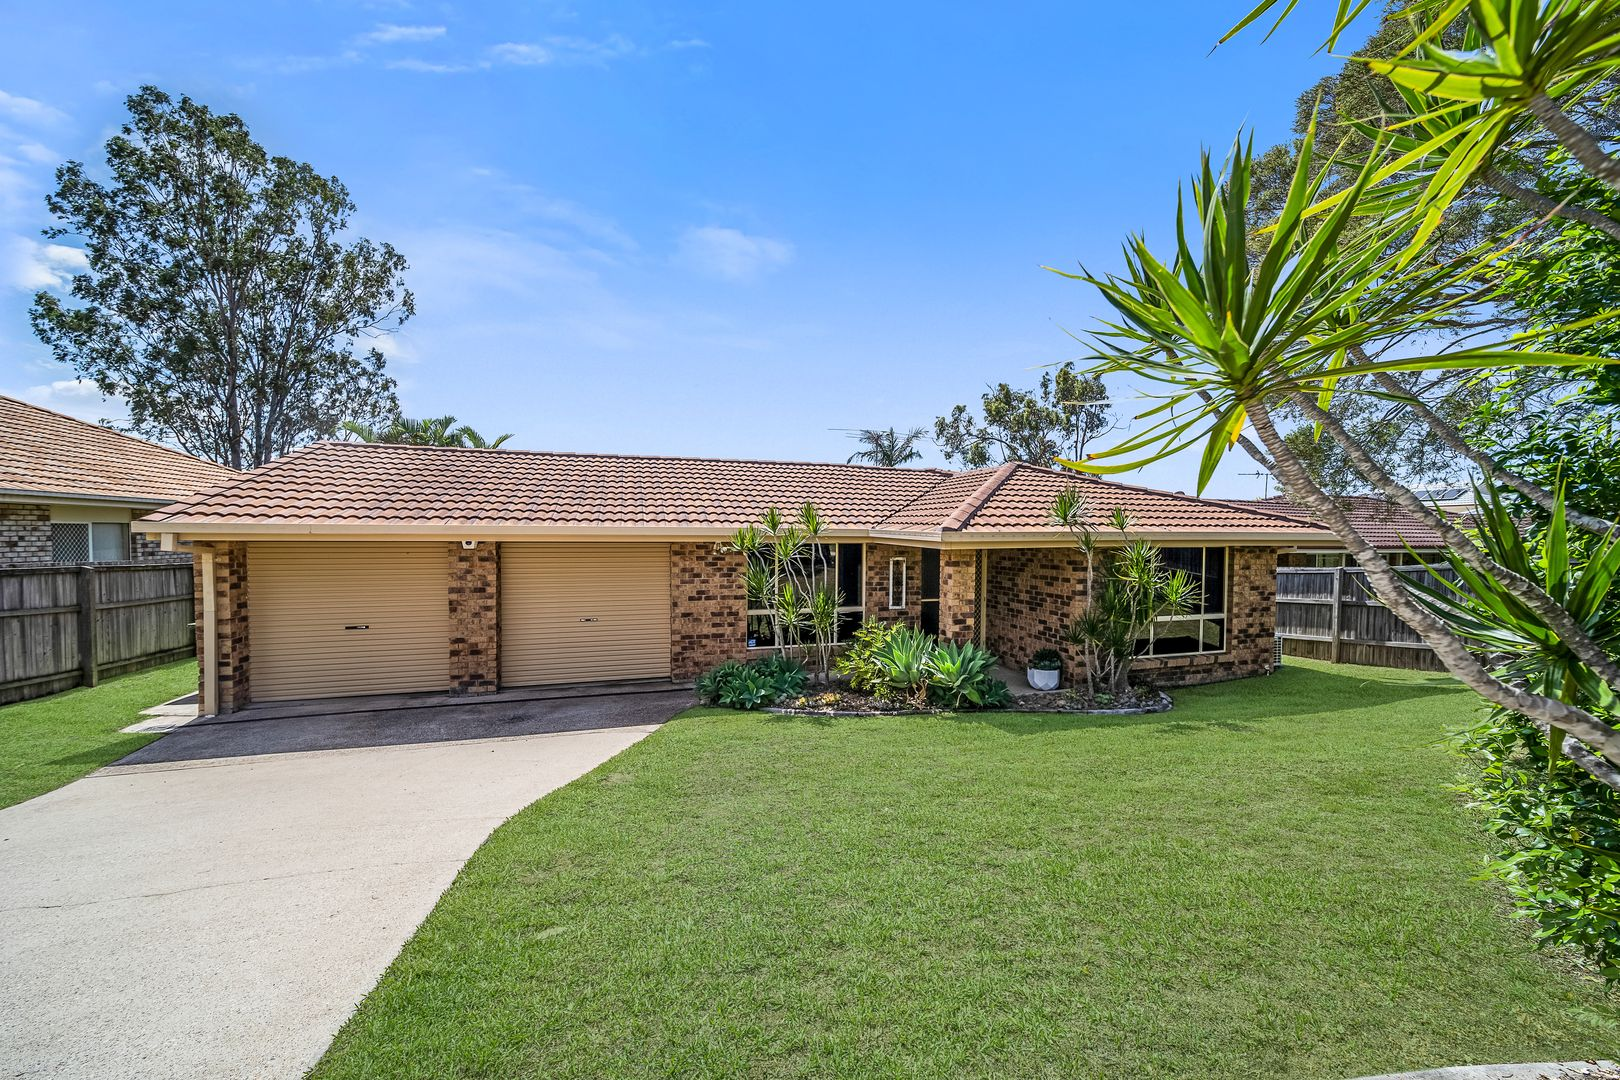 19 Sandra Ann Drive, Edens Landing QLD 4207, Image 0